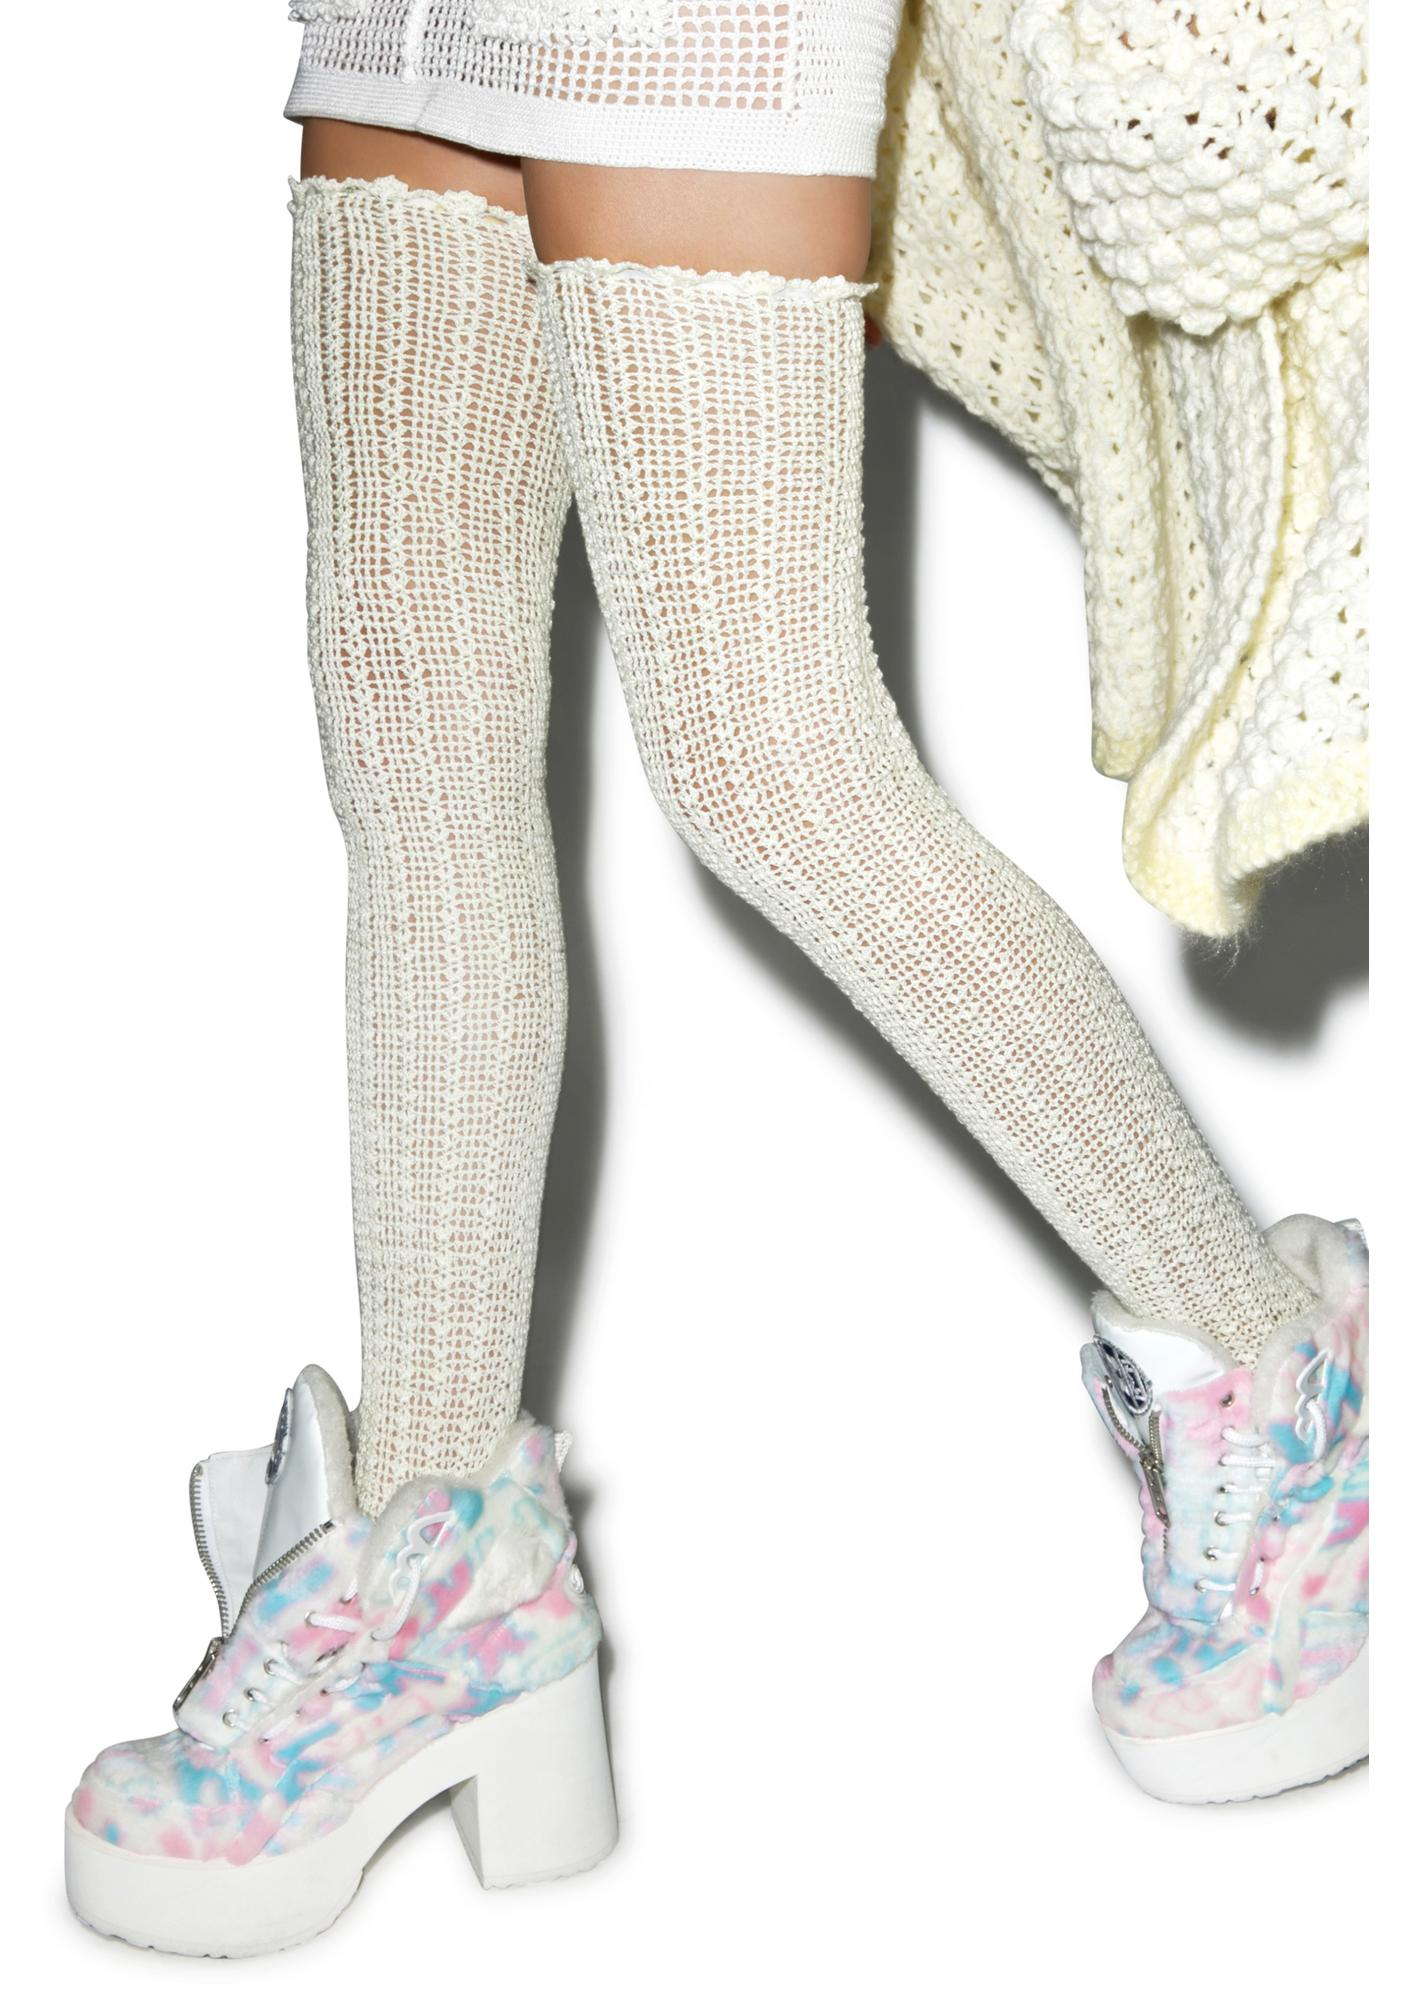 Maria ke Fisherman Crochet Thigh Highs